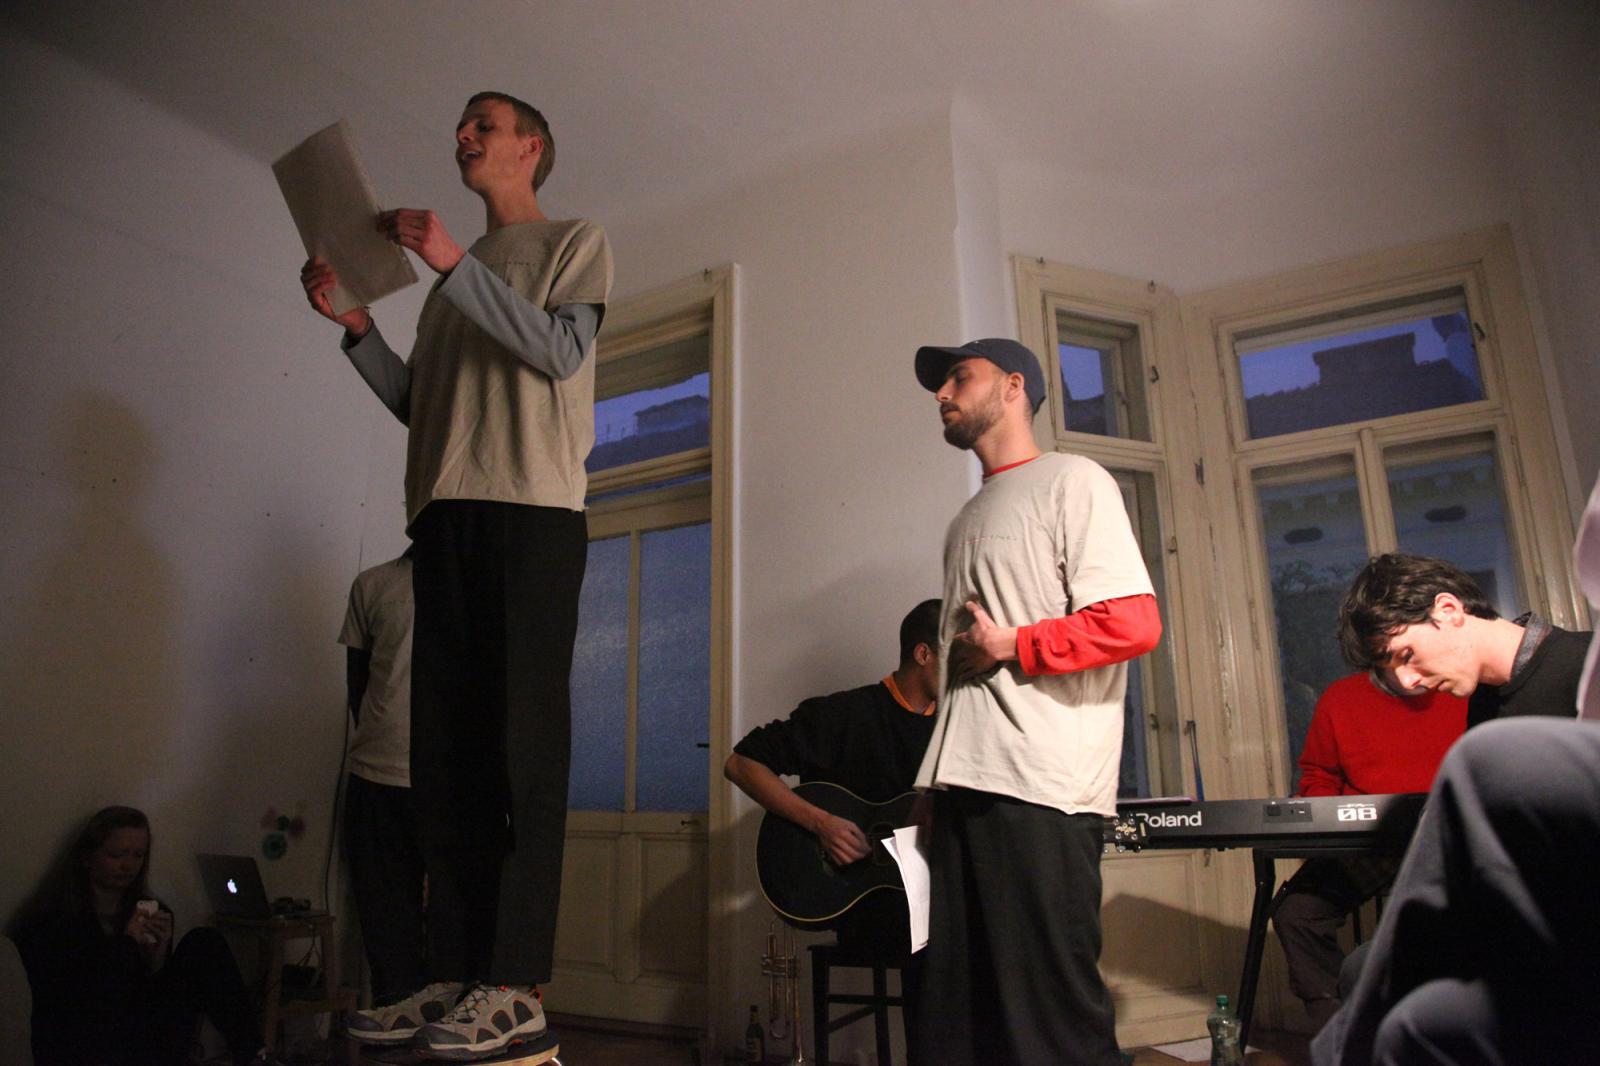 Performance of LOL Beslutning organized by Autocorrect